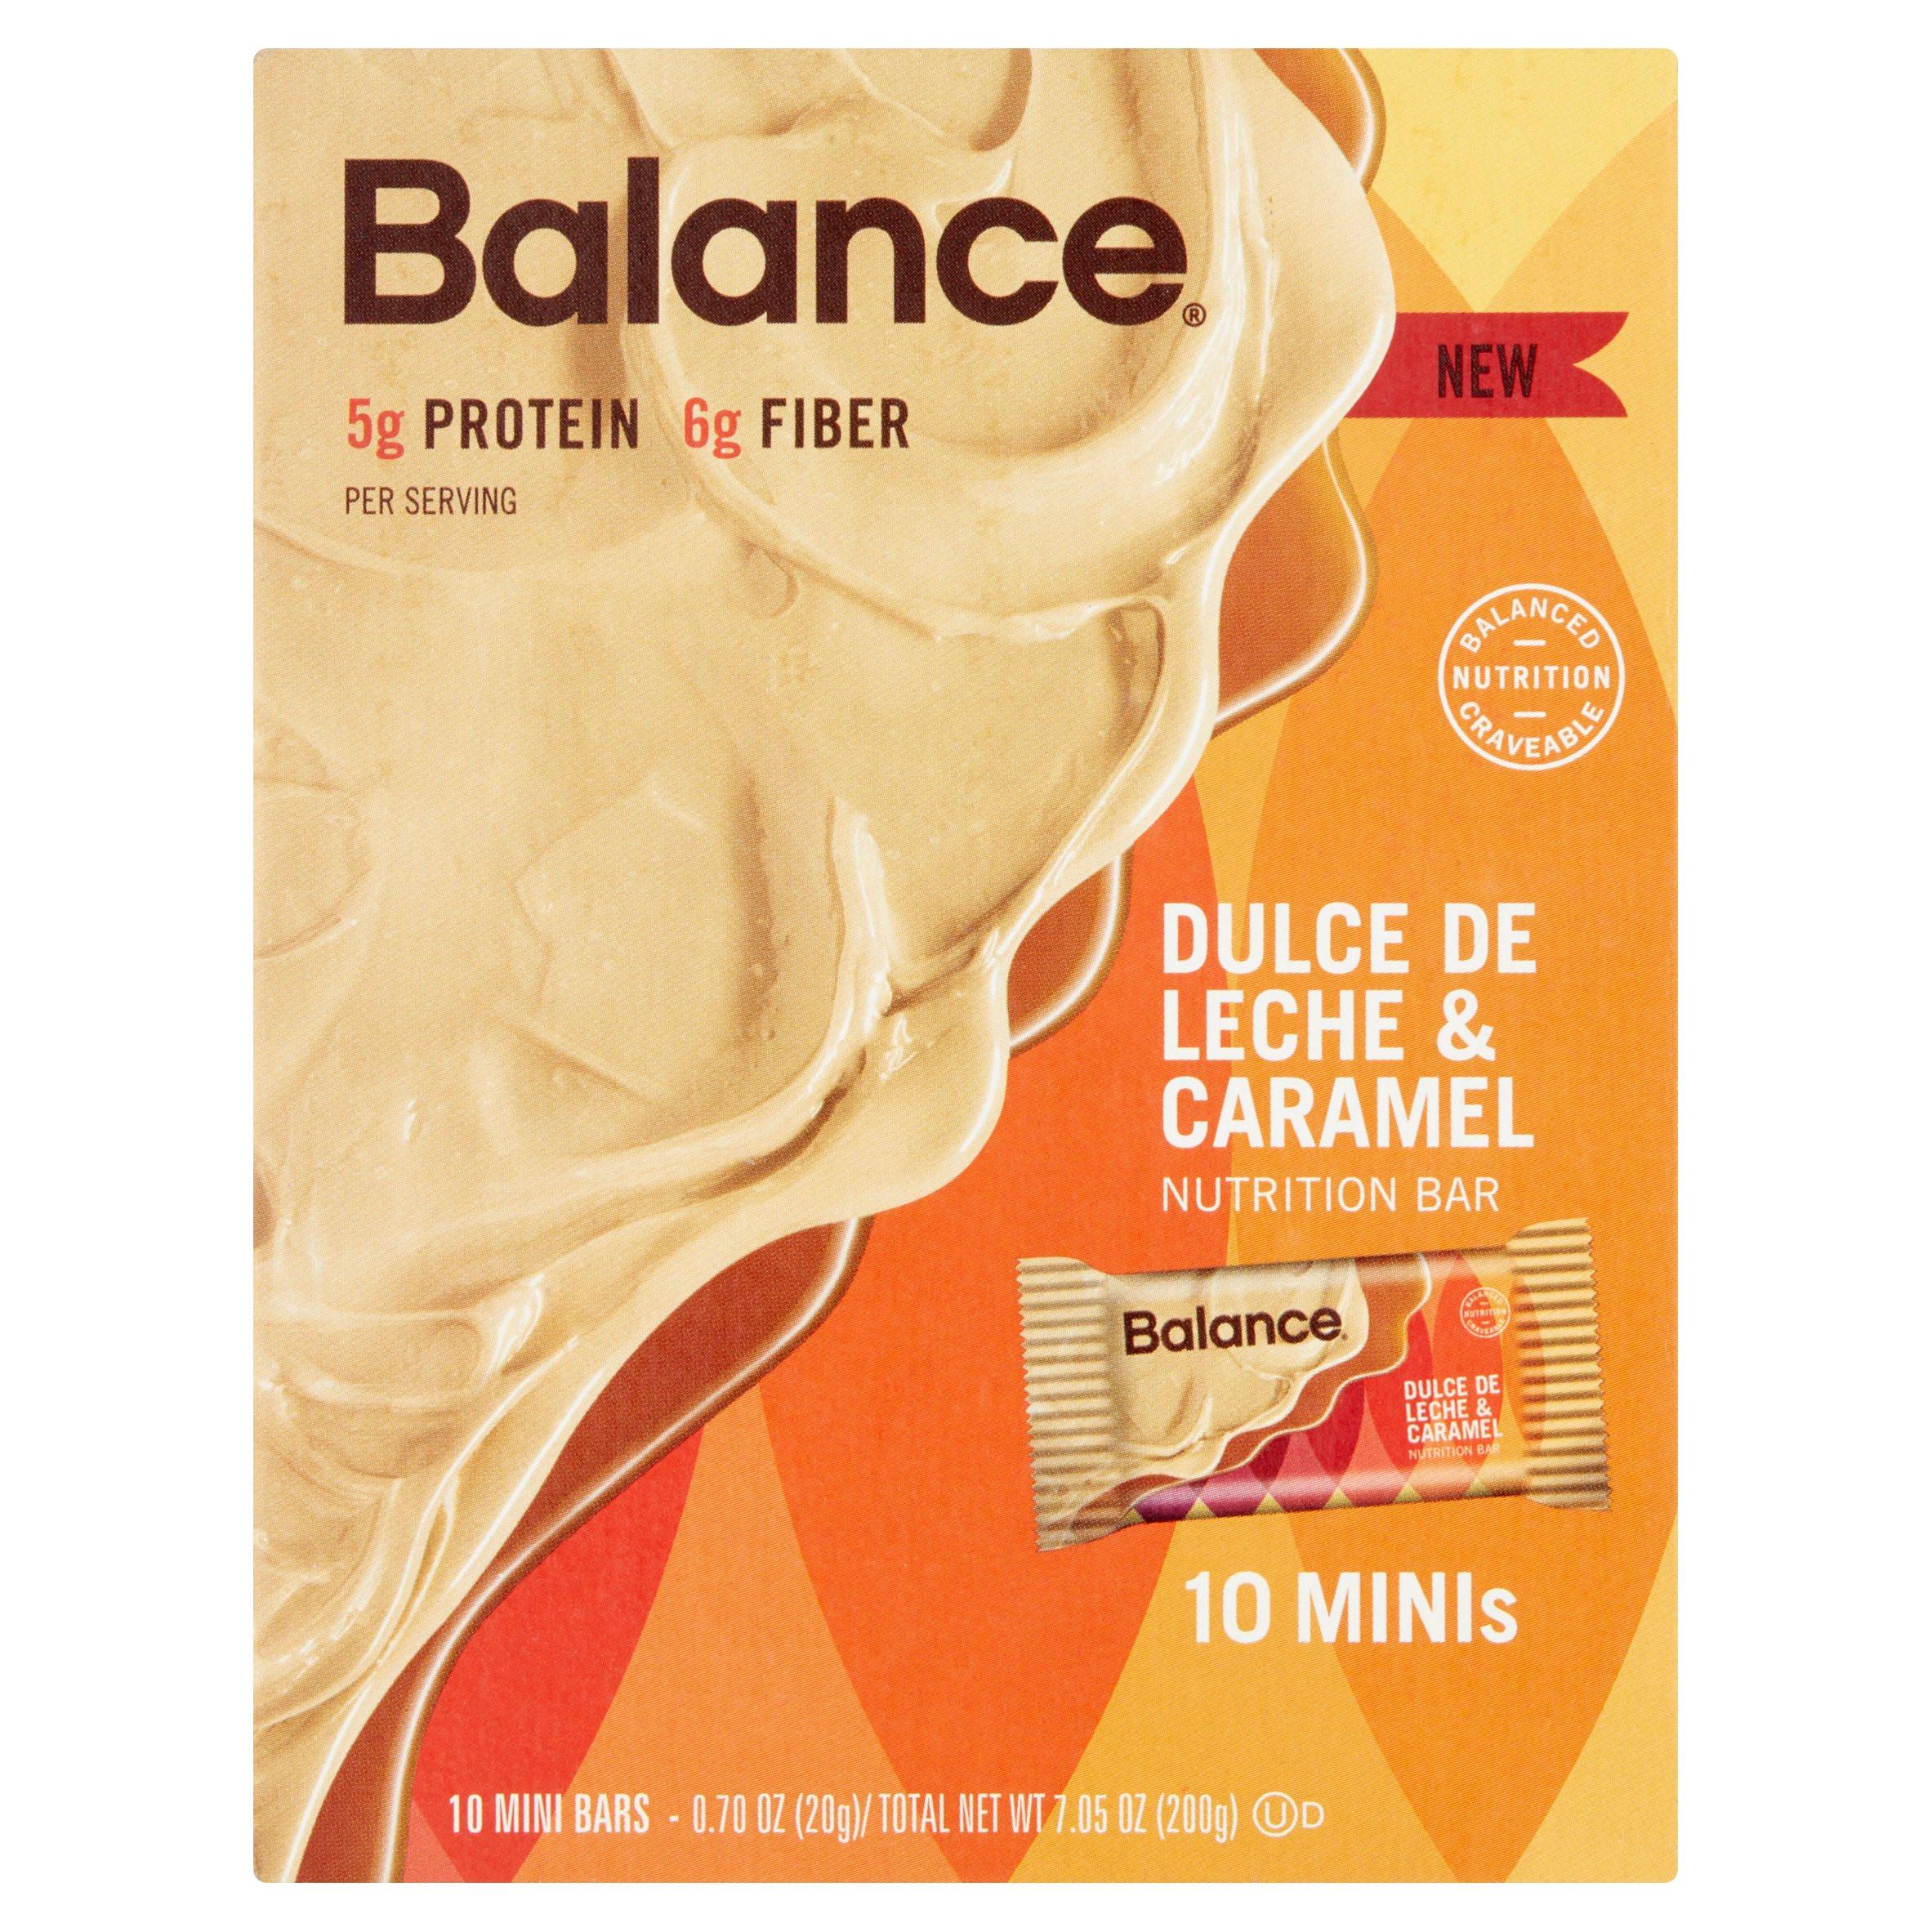 balance dulce de leche caramel nutrition bar 0 70 oz 10 count walmart com